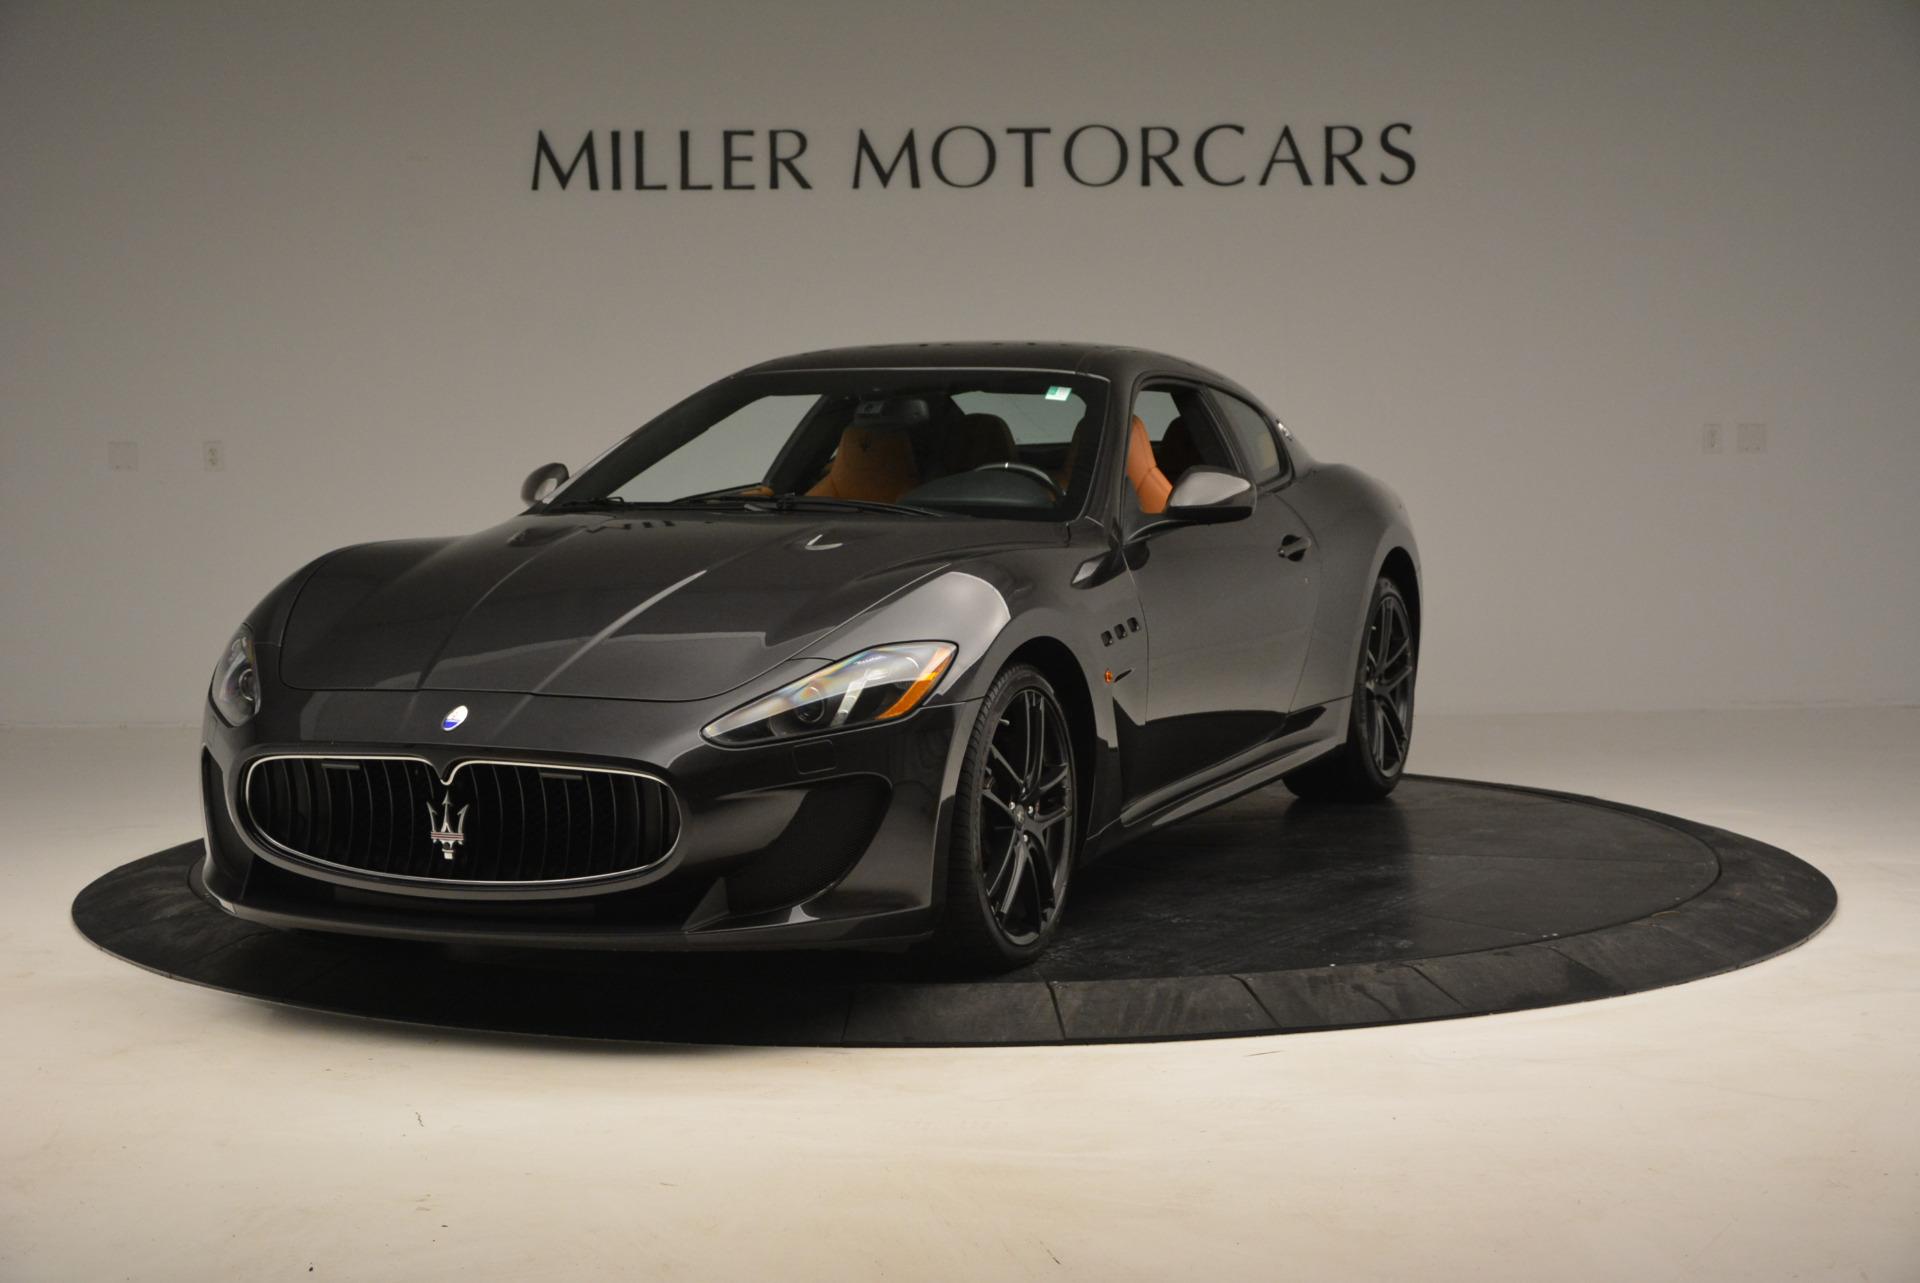 Used 2013 Maserati GranTurismo MC For Sale In Westport, CT 773_main